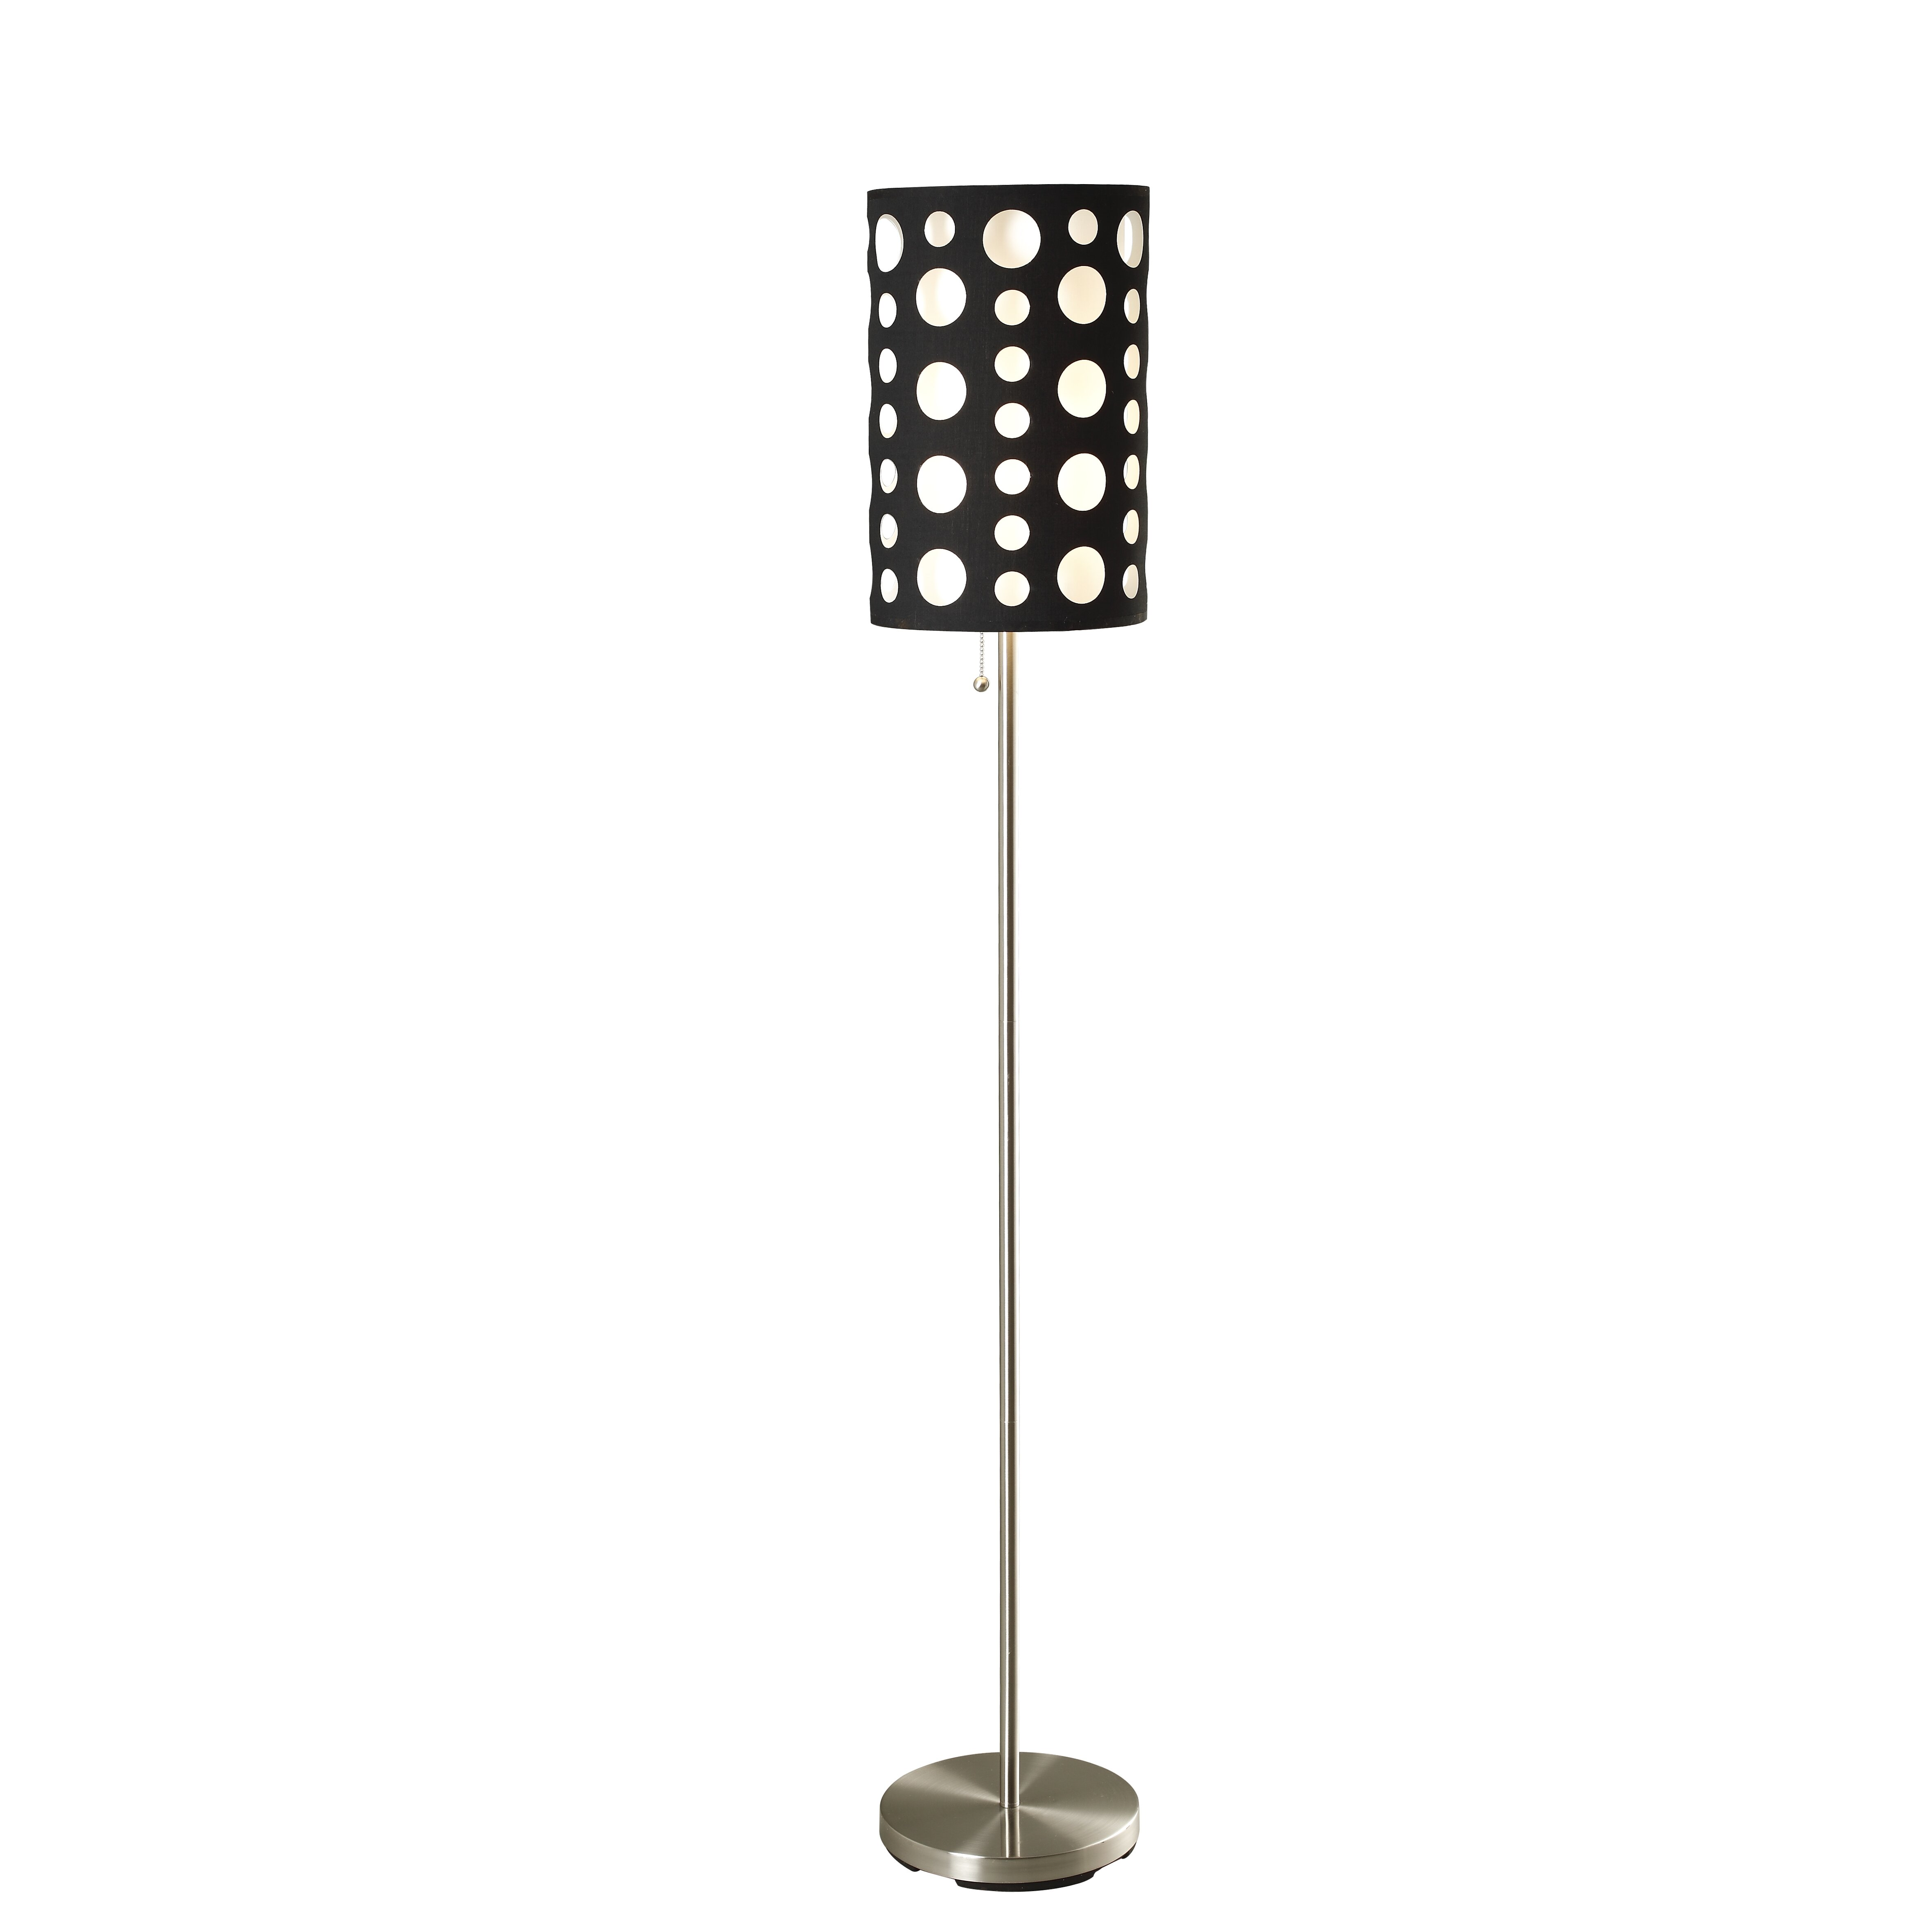 ore furniture retro 66 floor lamp reviews wayfair. Black Bedroom Furniture Sets. Home Design Ideas